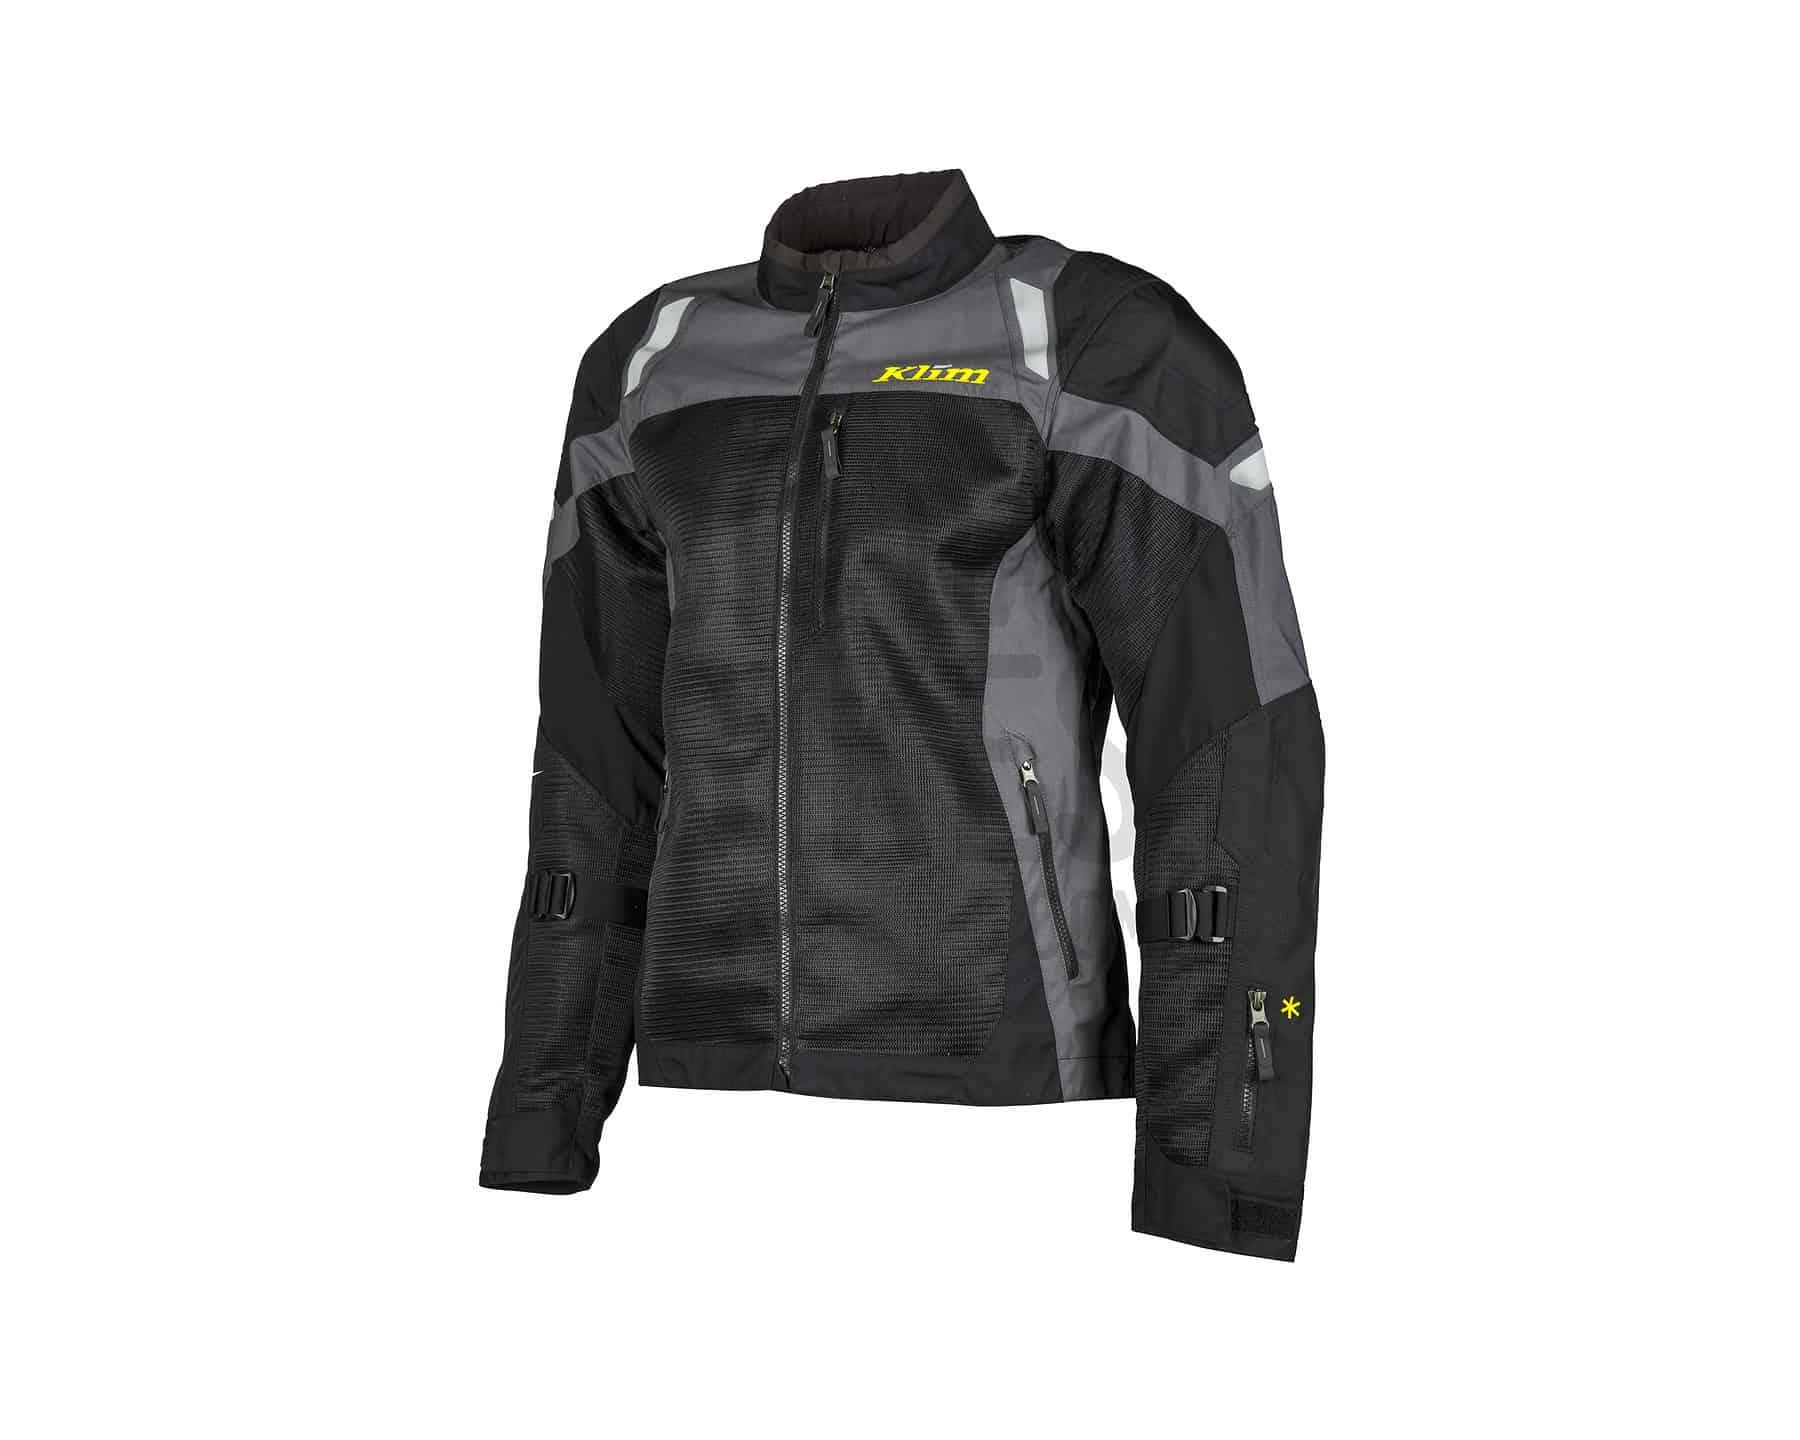 Induction Jacket_5060-002_Dark Gray_02